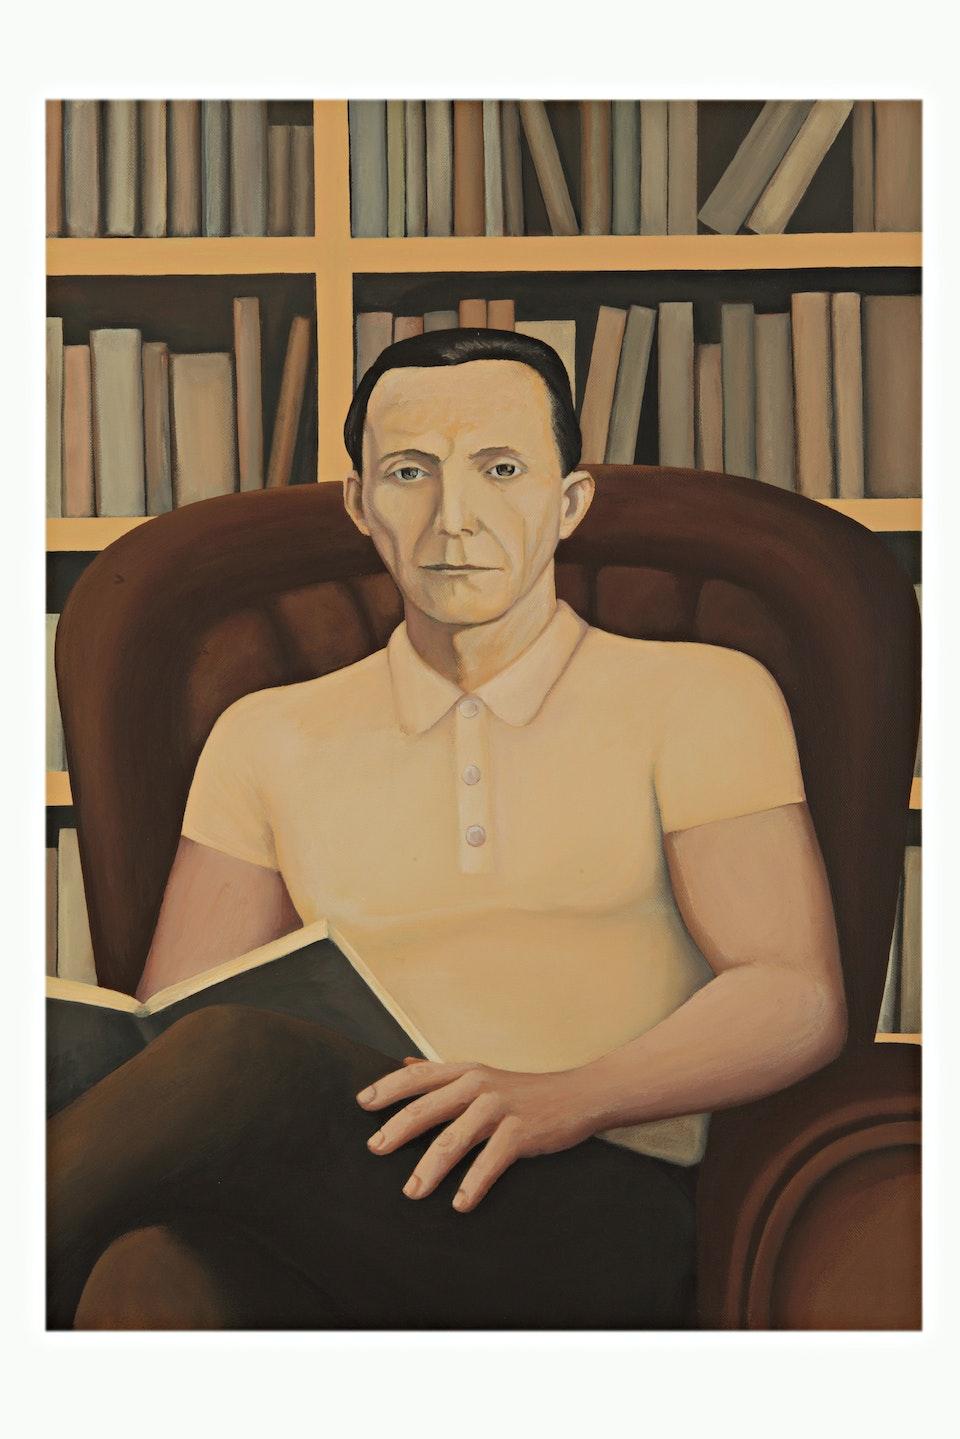 w_Joseph Goebbels imagined in the 21st century - acrylic on canvas - cm. 70x50 - 2010